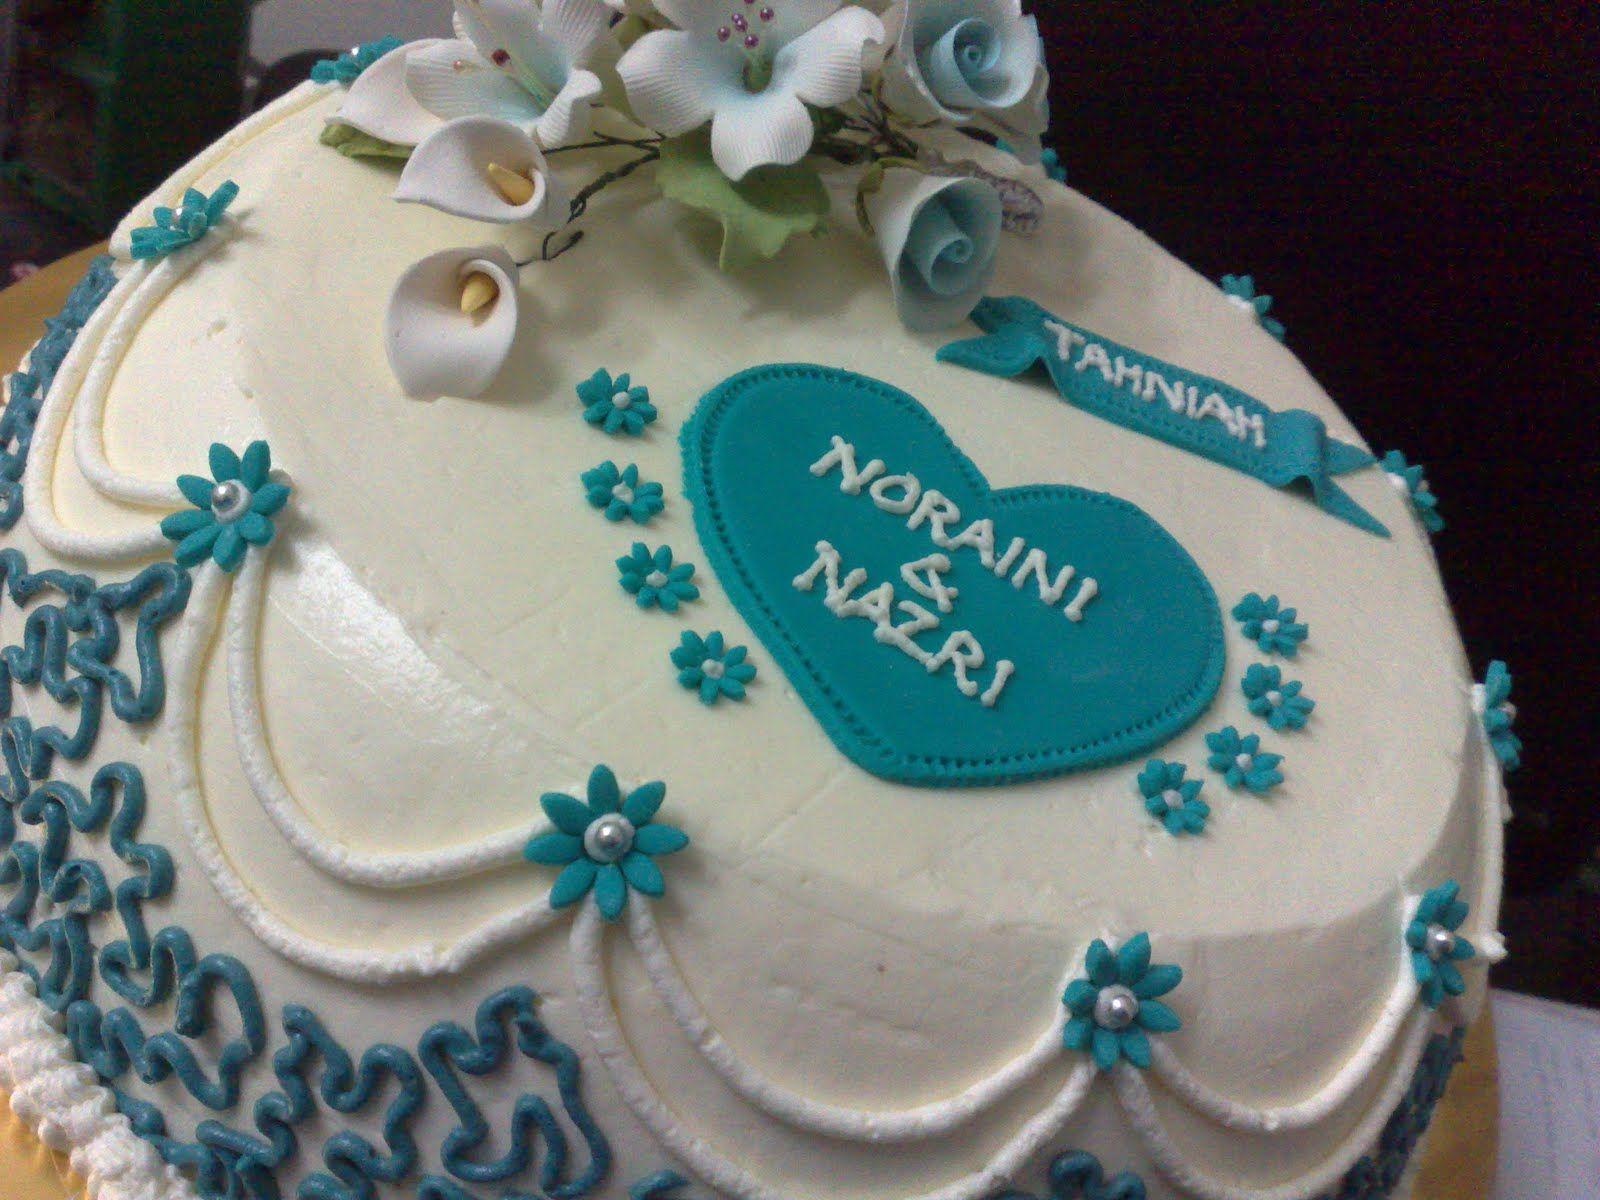 single layer indian wedding cakes | ... Cakes Ipoh 012-5991233 ...